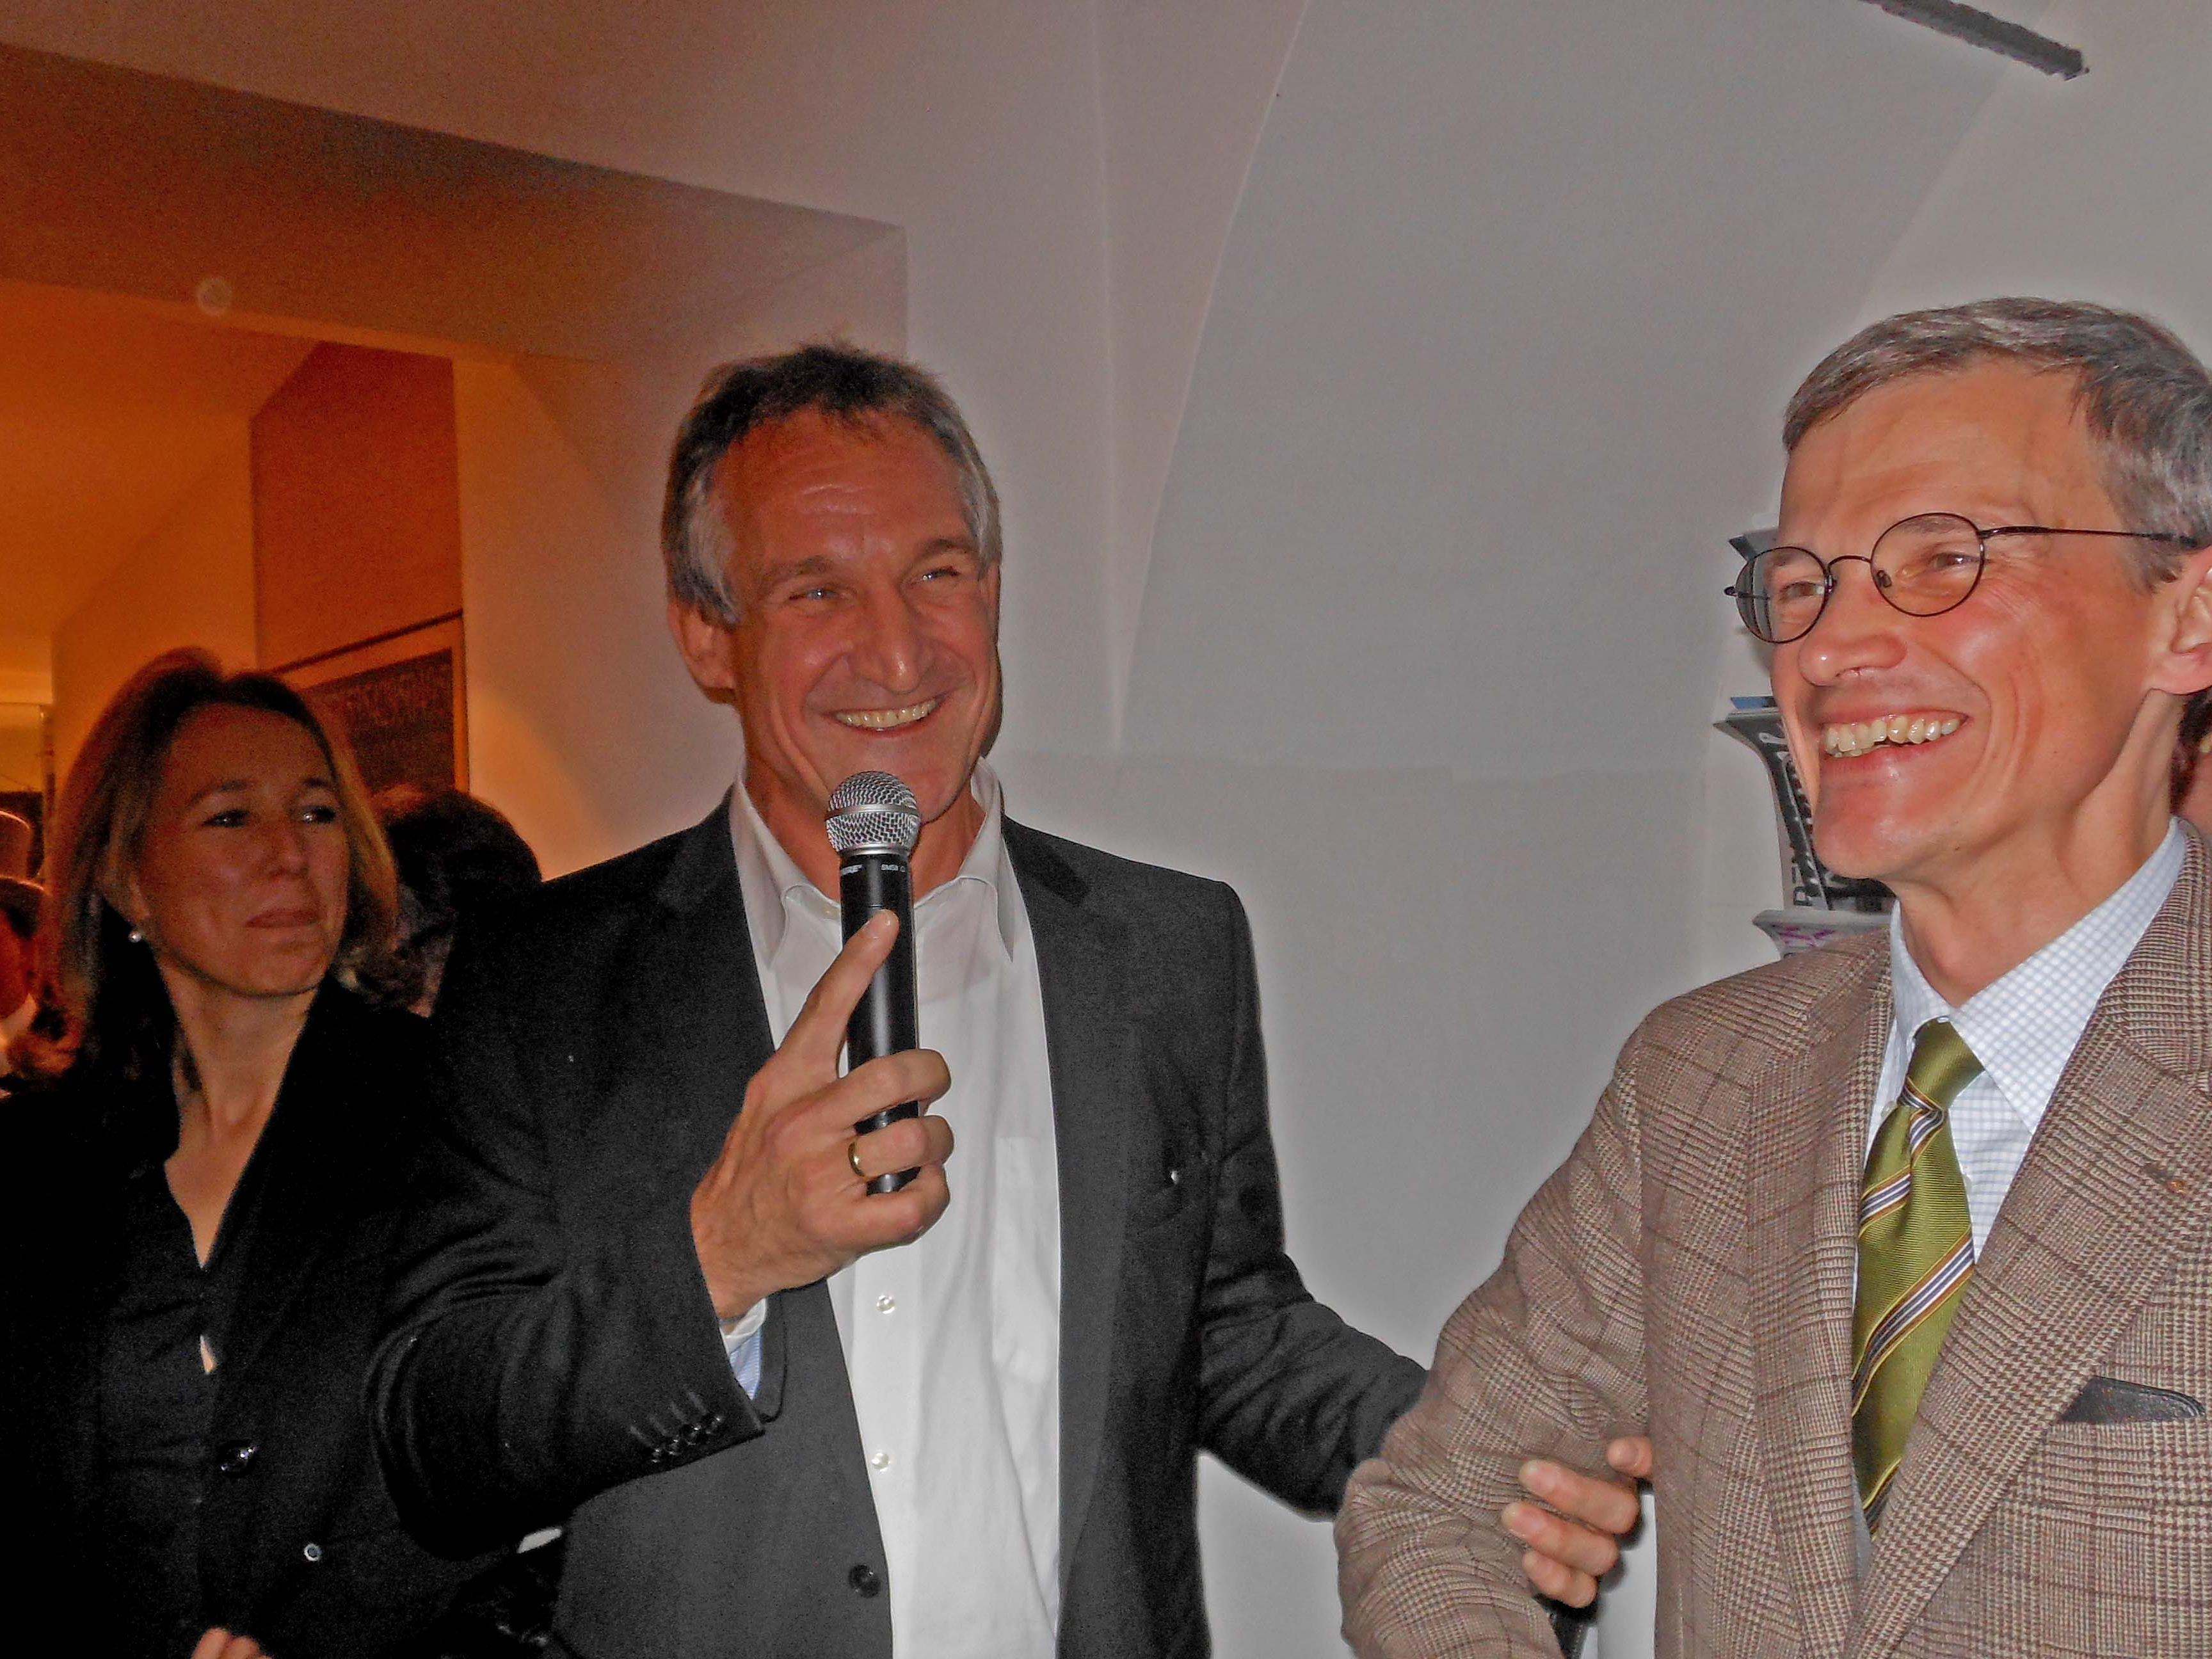 Bürgermeister Markus Linhart mit der Hauptperson, dem Stadtarchivar Thomas Klagian.